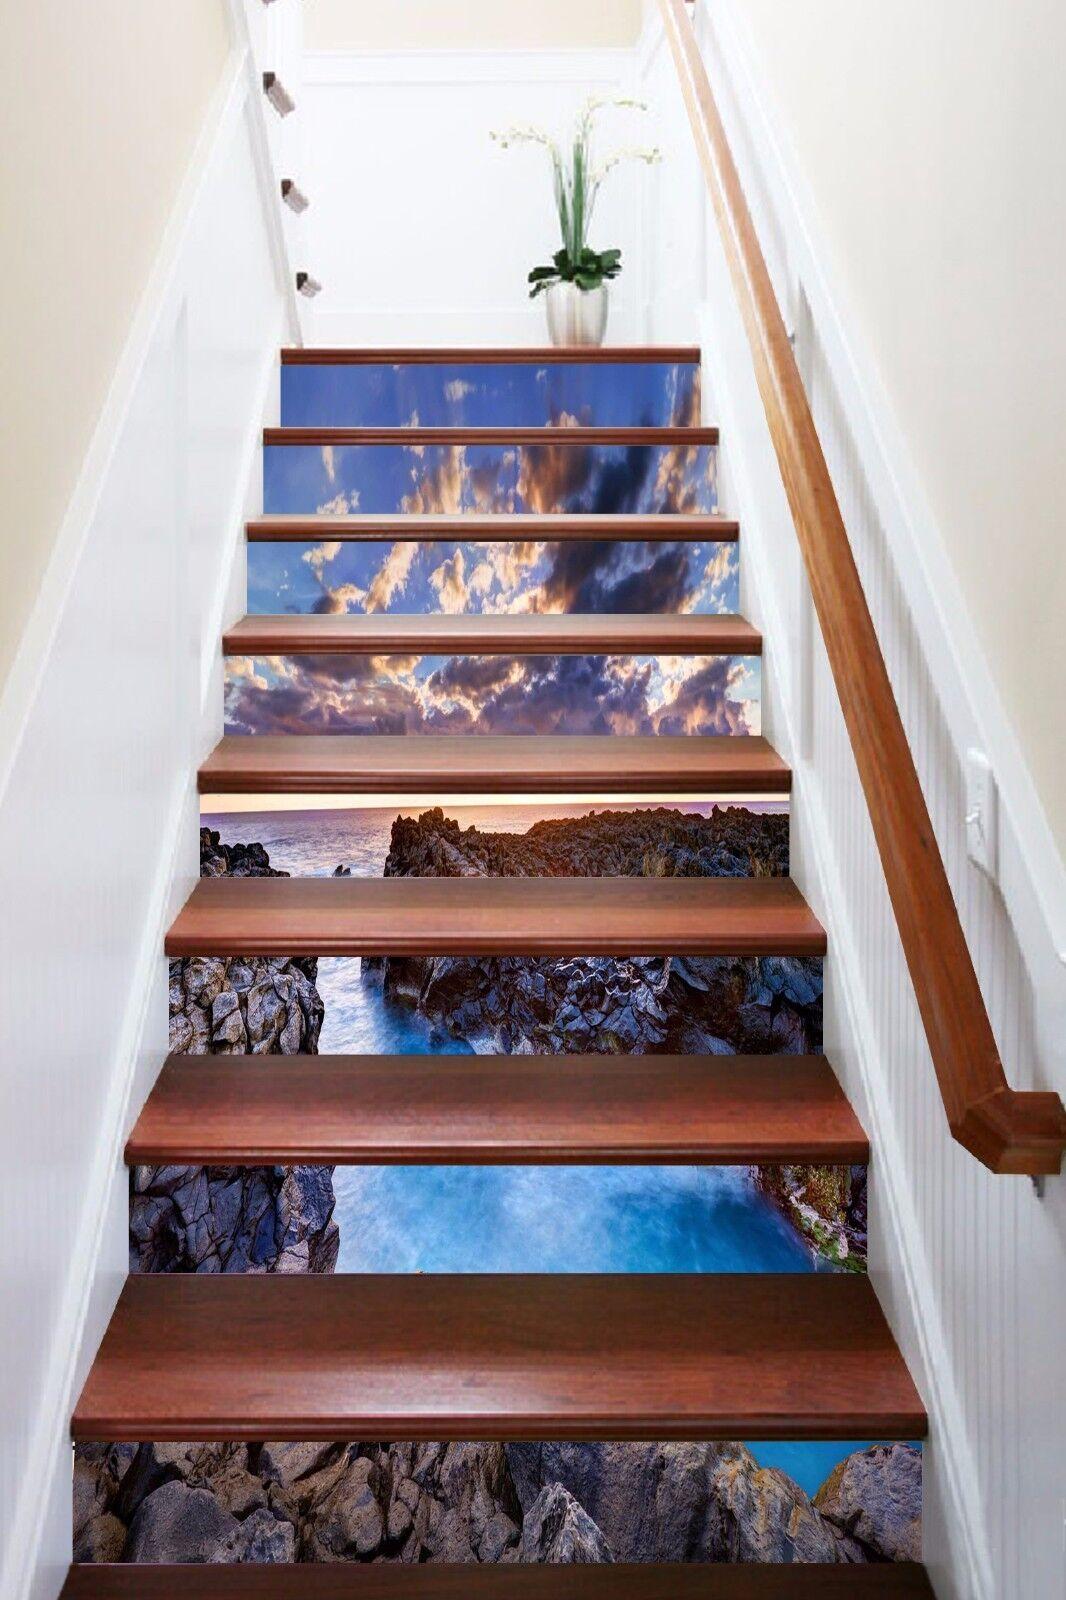 3D Coast View 776 Stair Risers Decoration Photo Mural Vinyl Decal Wallpaper AU